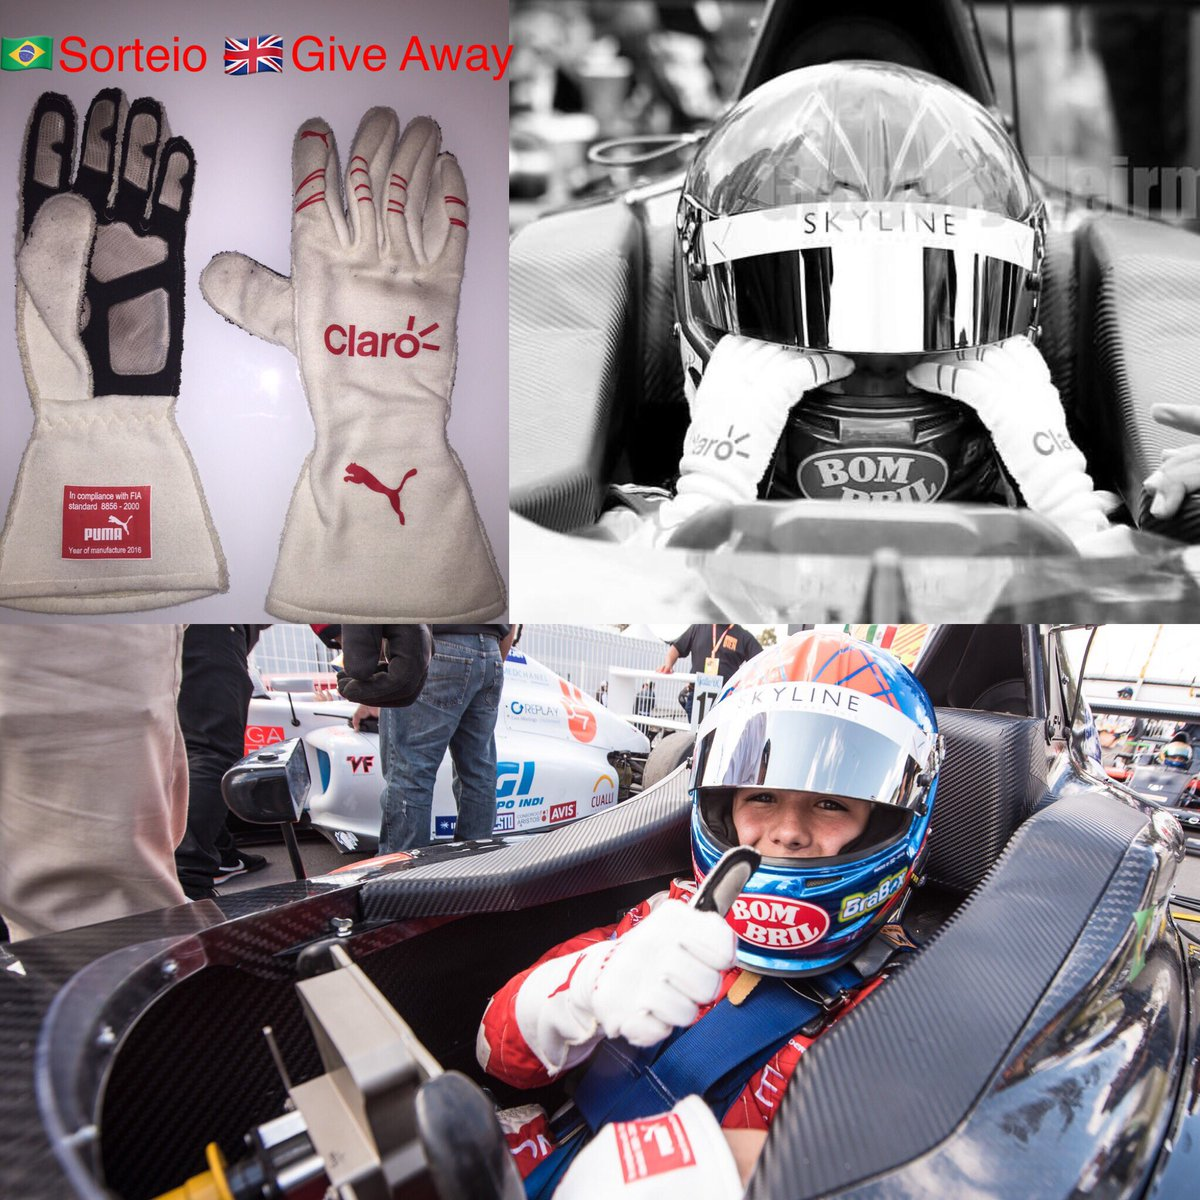 🇬🇧Giving Away my racing gloves to a lucky fan ‼️ReTweet to enter‼️ - 🇧🇷Estou dando a minhas luvas de corrida para um fãn! RT para participar https://t.co/X3X2FNYp8L